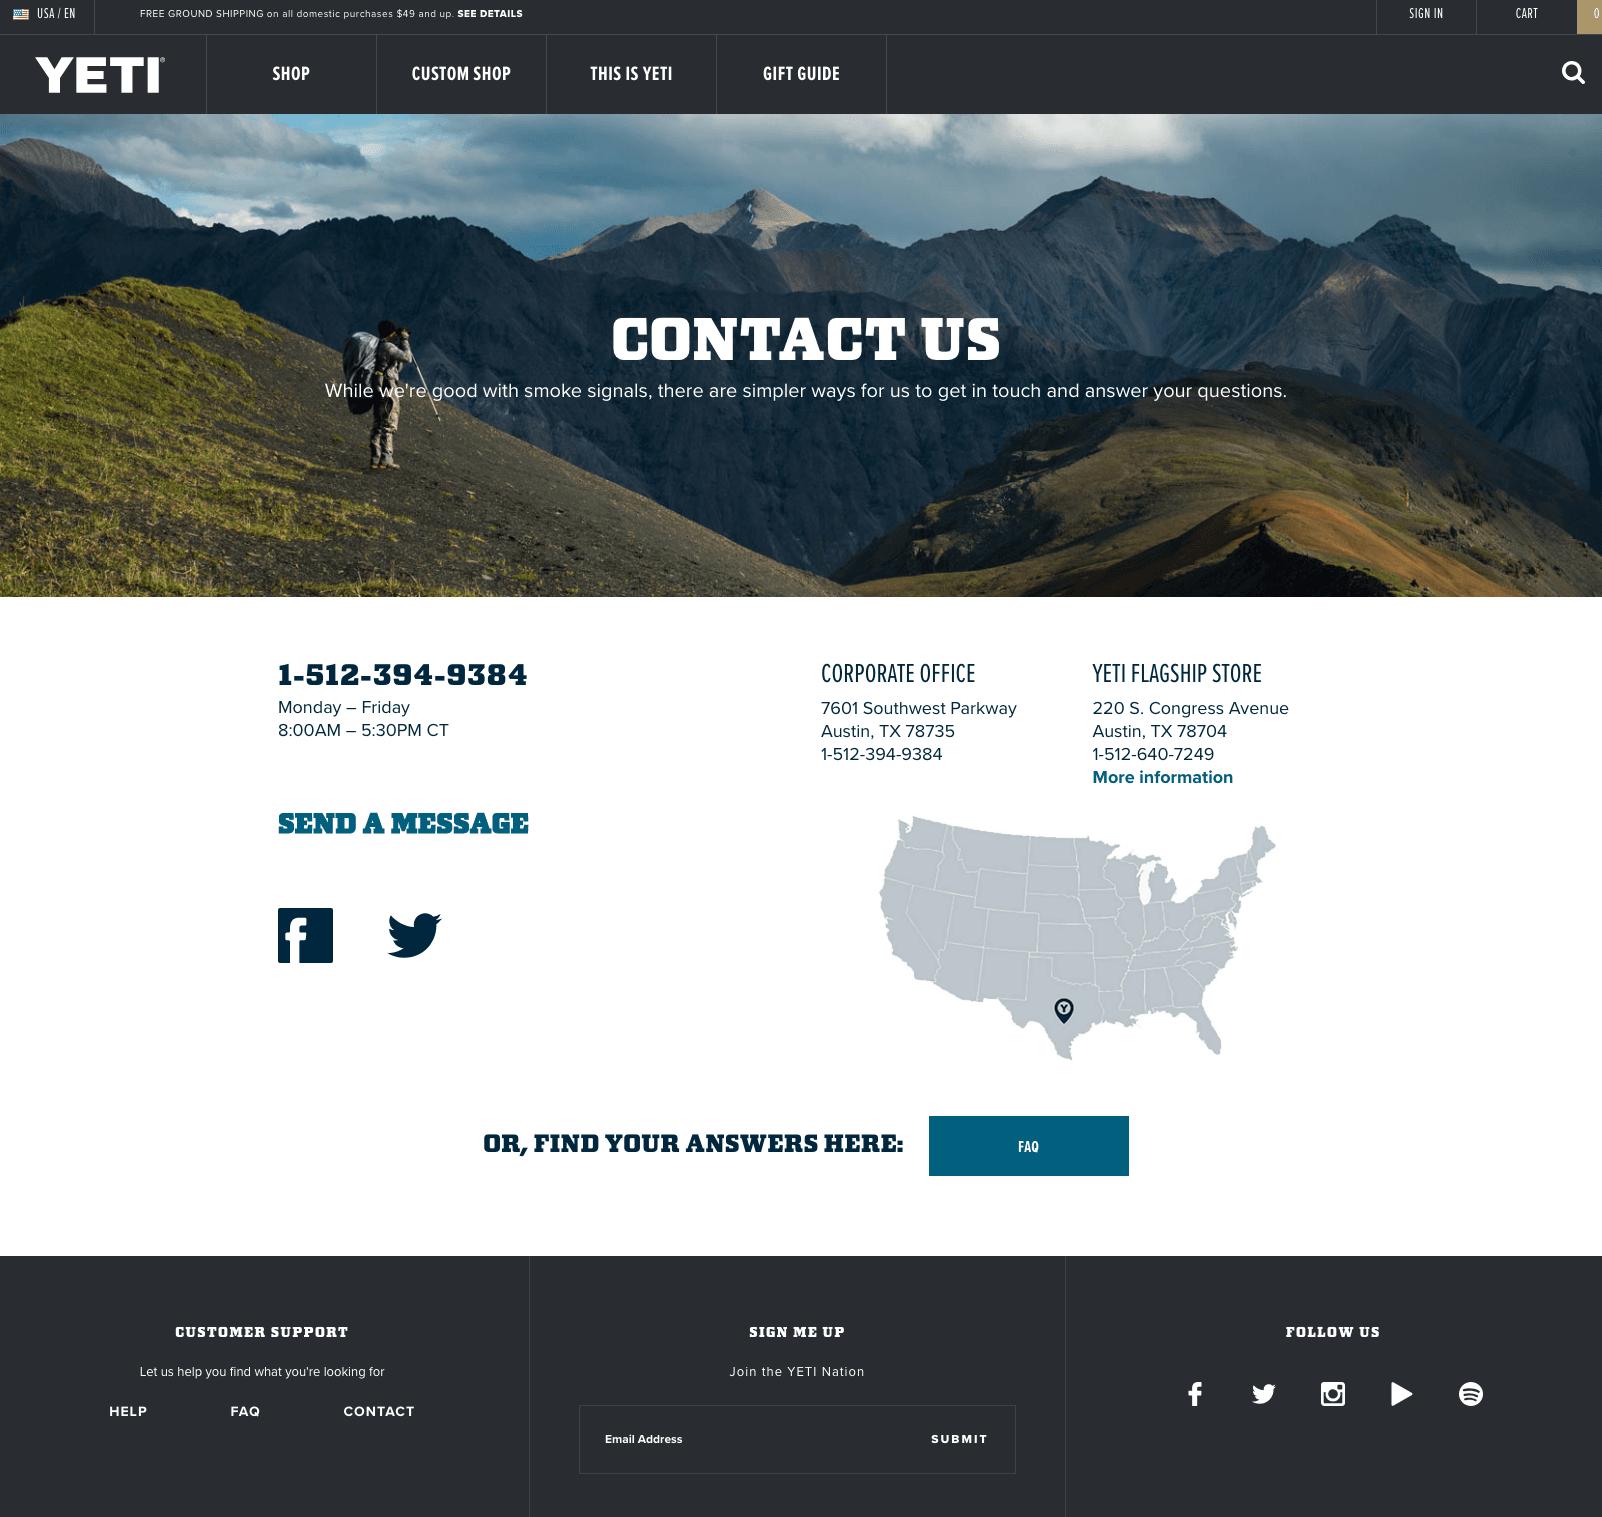 yeti-contact-us-page-update